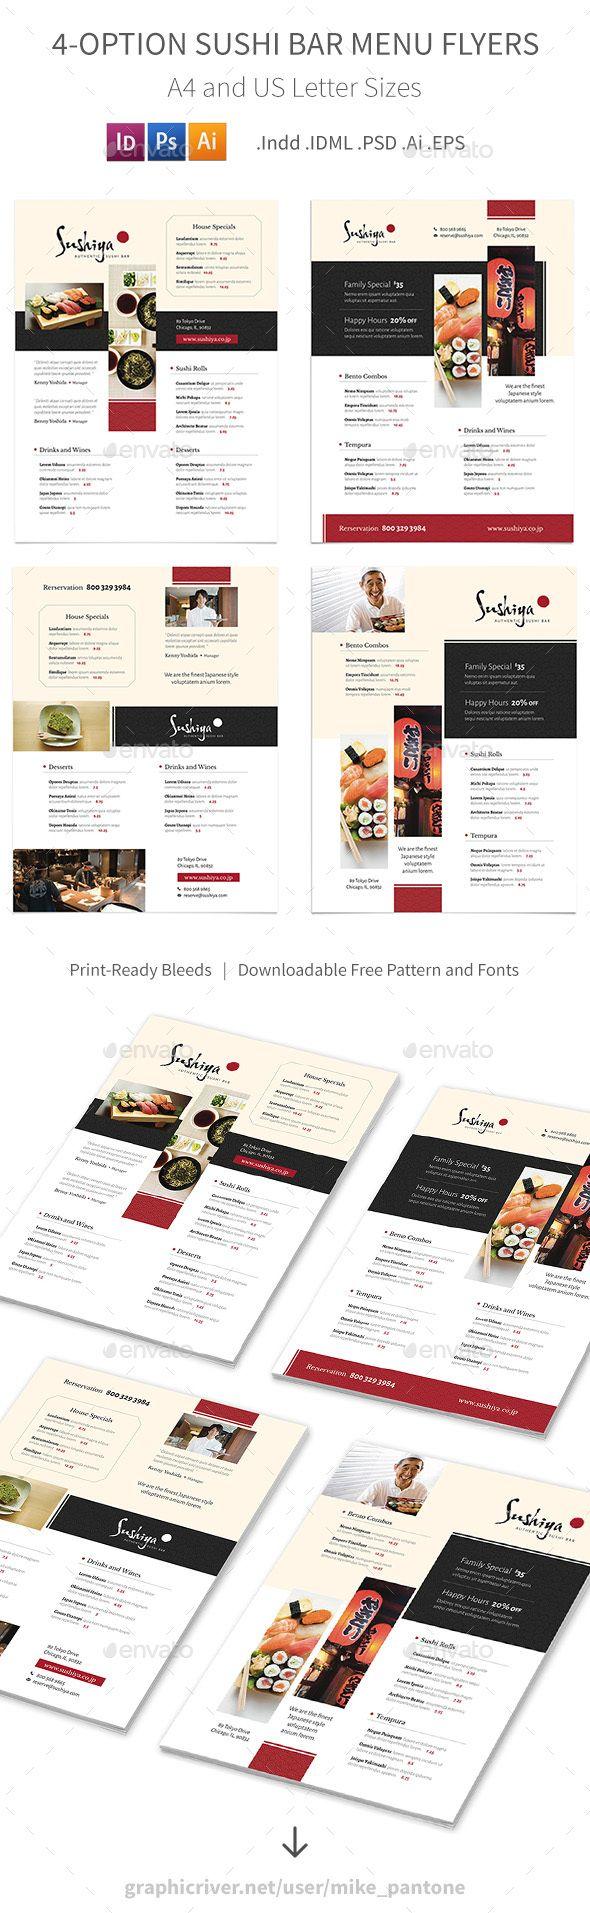 Sushi Bar Menu Flyers – 4 Options - Food Menus Print Templates Download here : https://graphicriver.net/item/sushi-bar-menu-flyers-4-options/19273342?s_rank=76&ref=Al-fatih